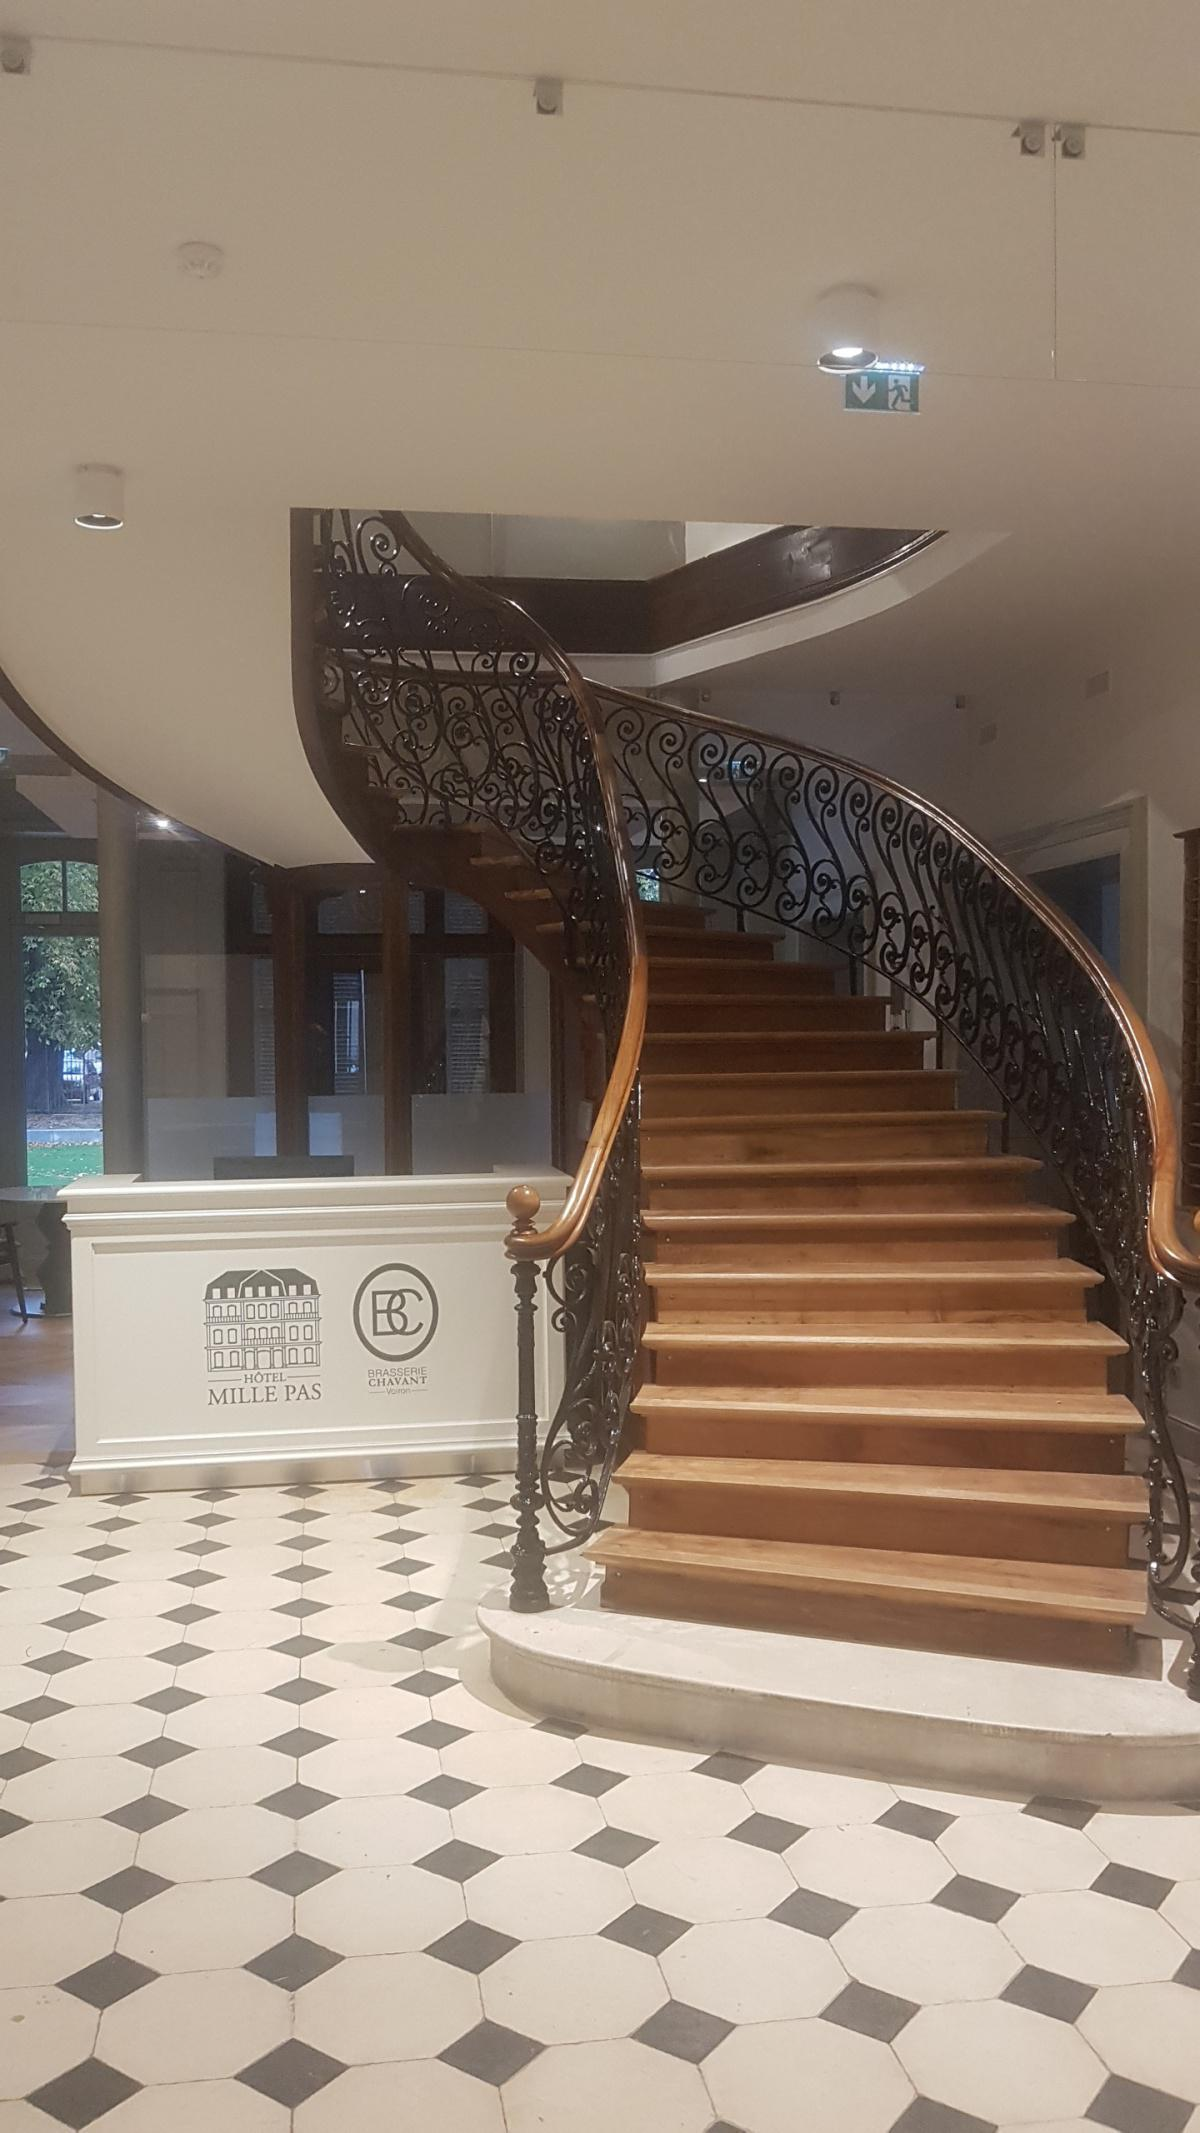 Hotel Mille Pas - Brasserie Chavant